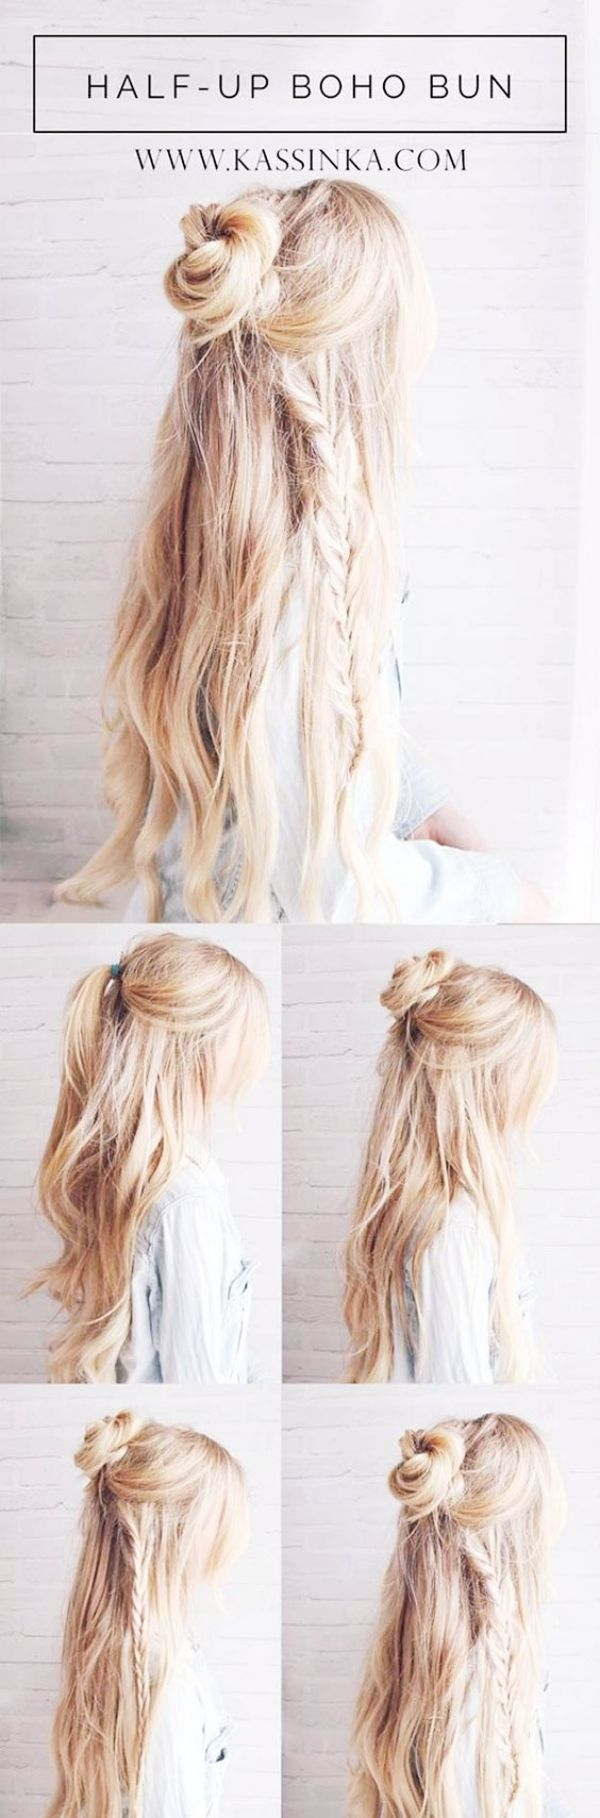 Hal up Boho Bun ||| Half up Half Down Hairstyles ||| Updo Hairstyles ...